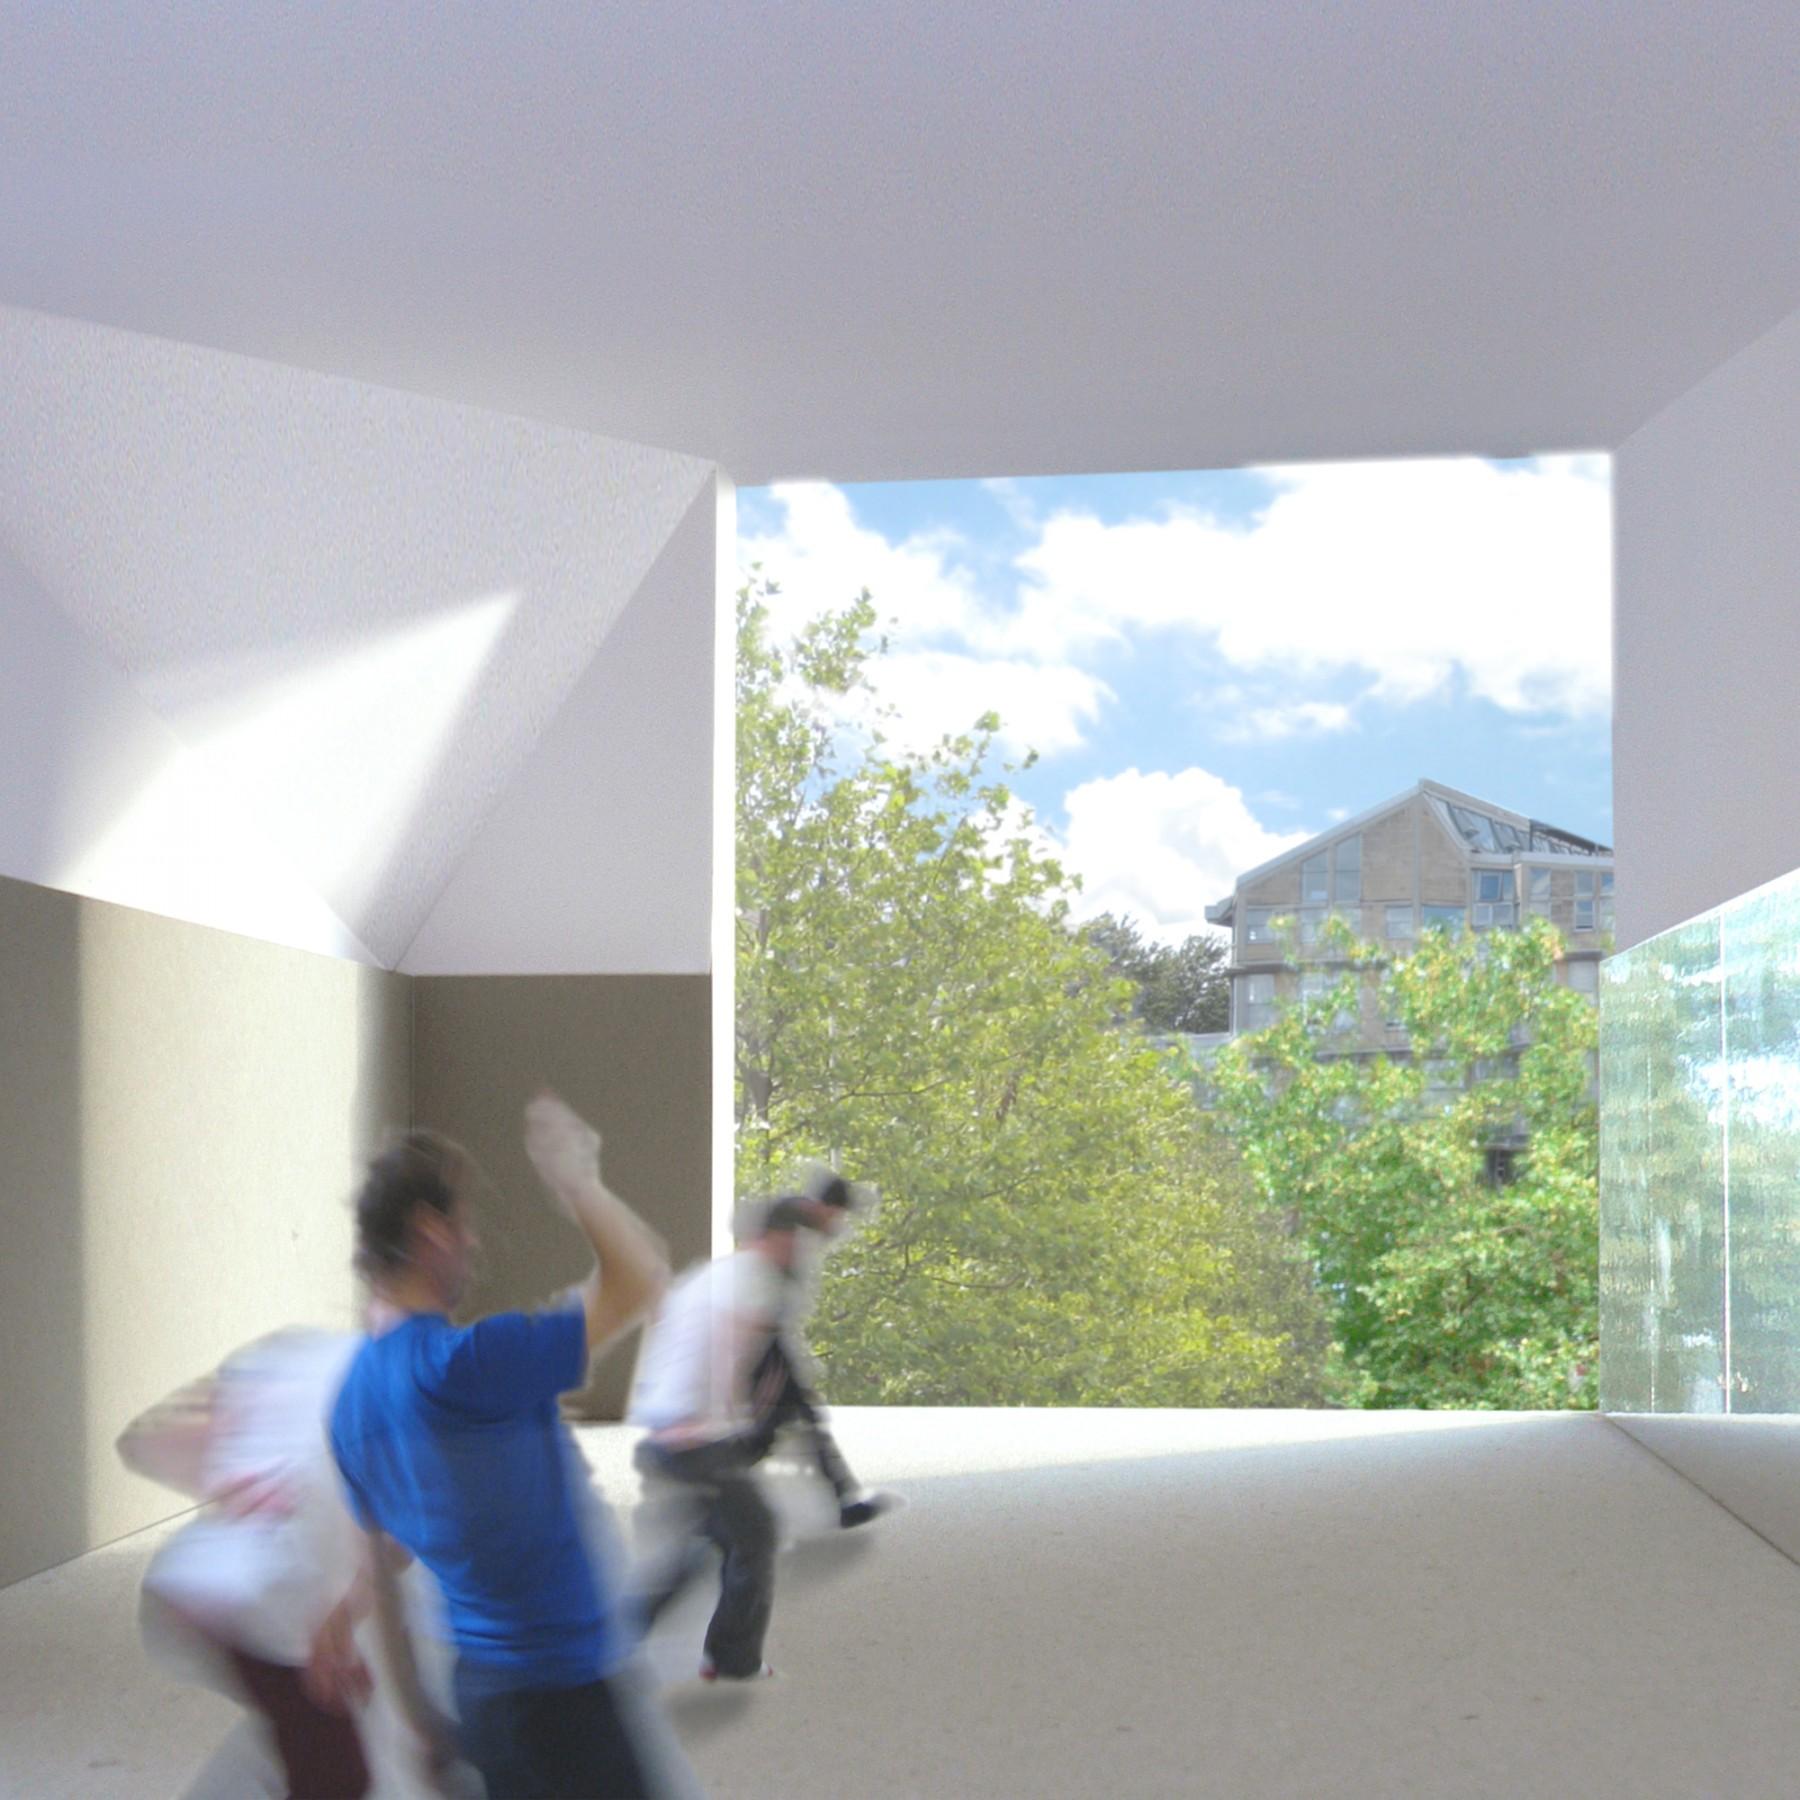 University-Bath-Creative-Arts-Centre-short-list-education-somerset-campus-theatre-Jamie-Fobert-architects-2